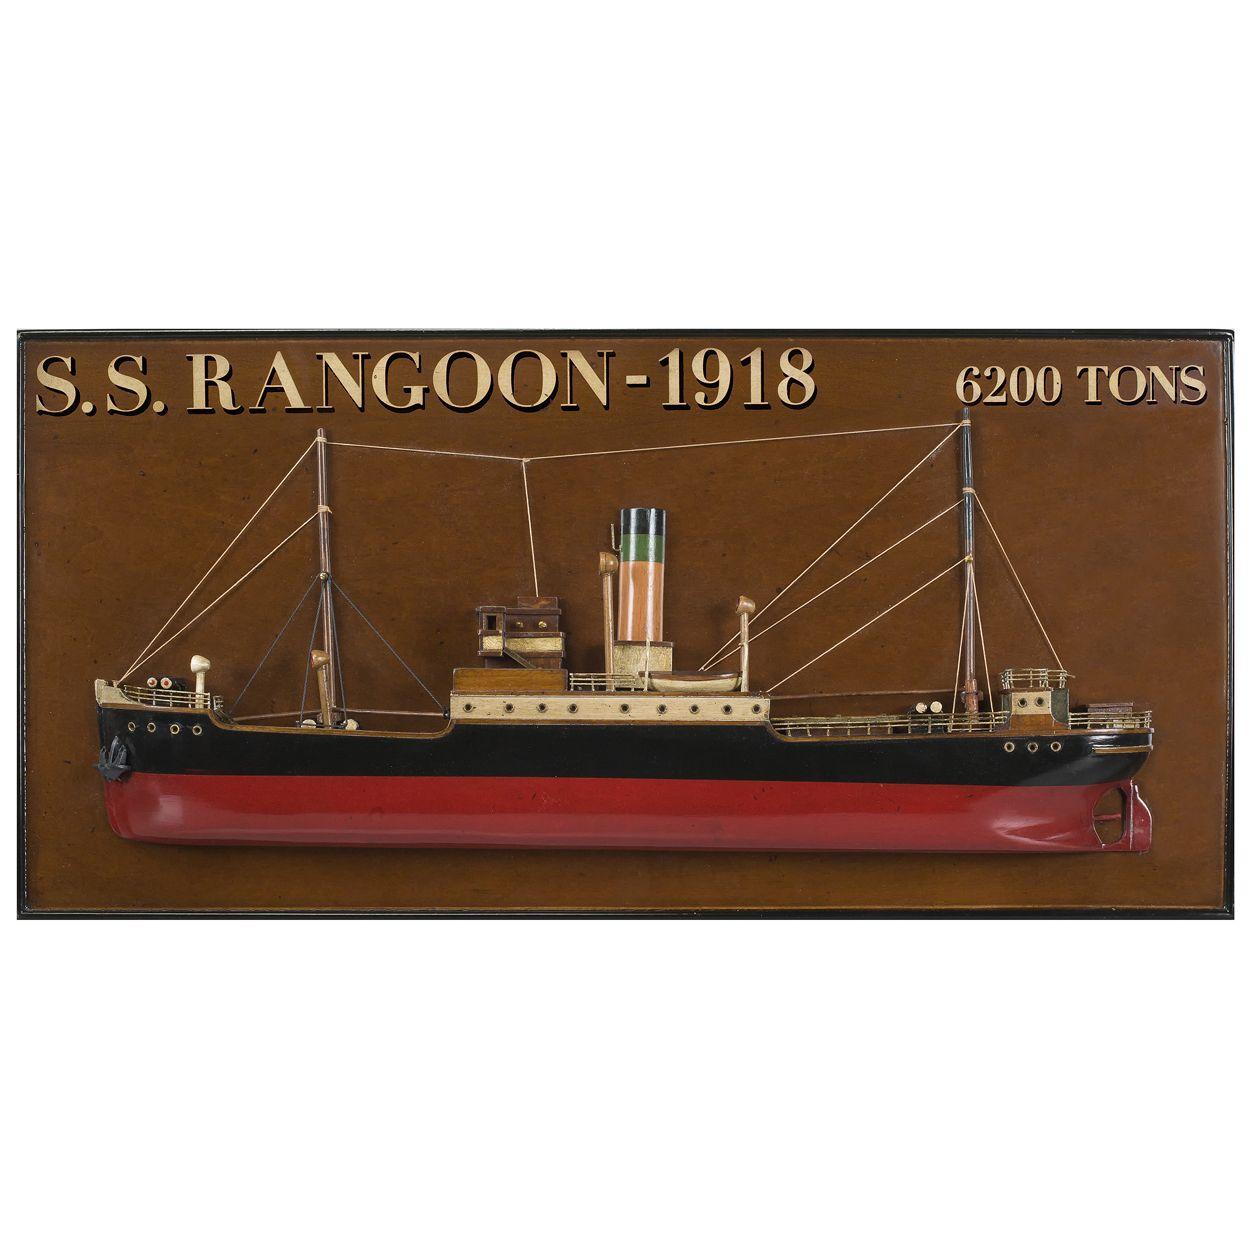 ... (http://www.captjimscargo.com/nautical-home-decor/other-nautical-decor/s-s-rangoon-1918-tramp-steamer-wooden-half-model-25-wall-decor/)  The Rangoon ...